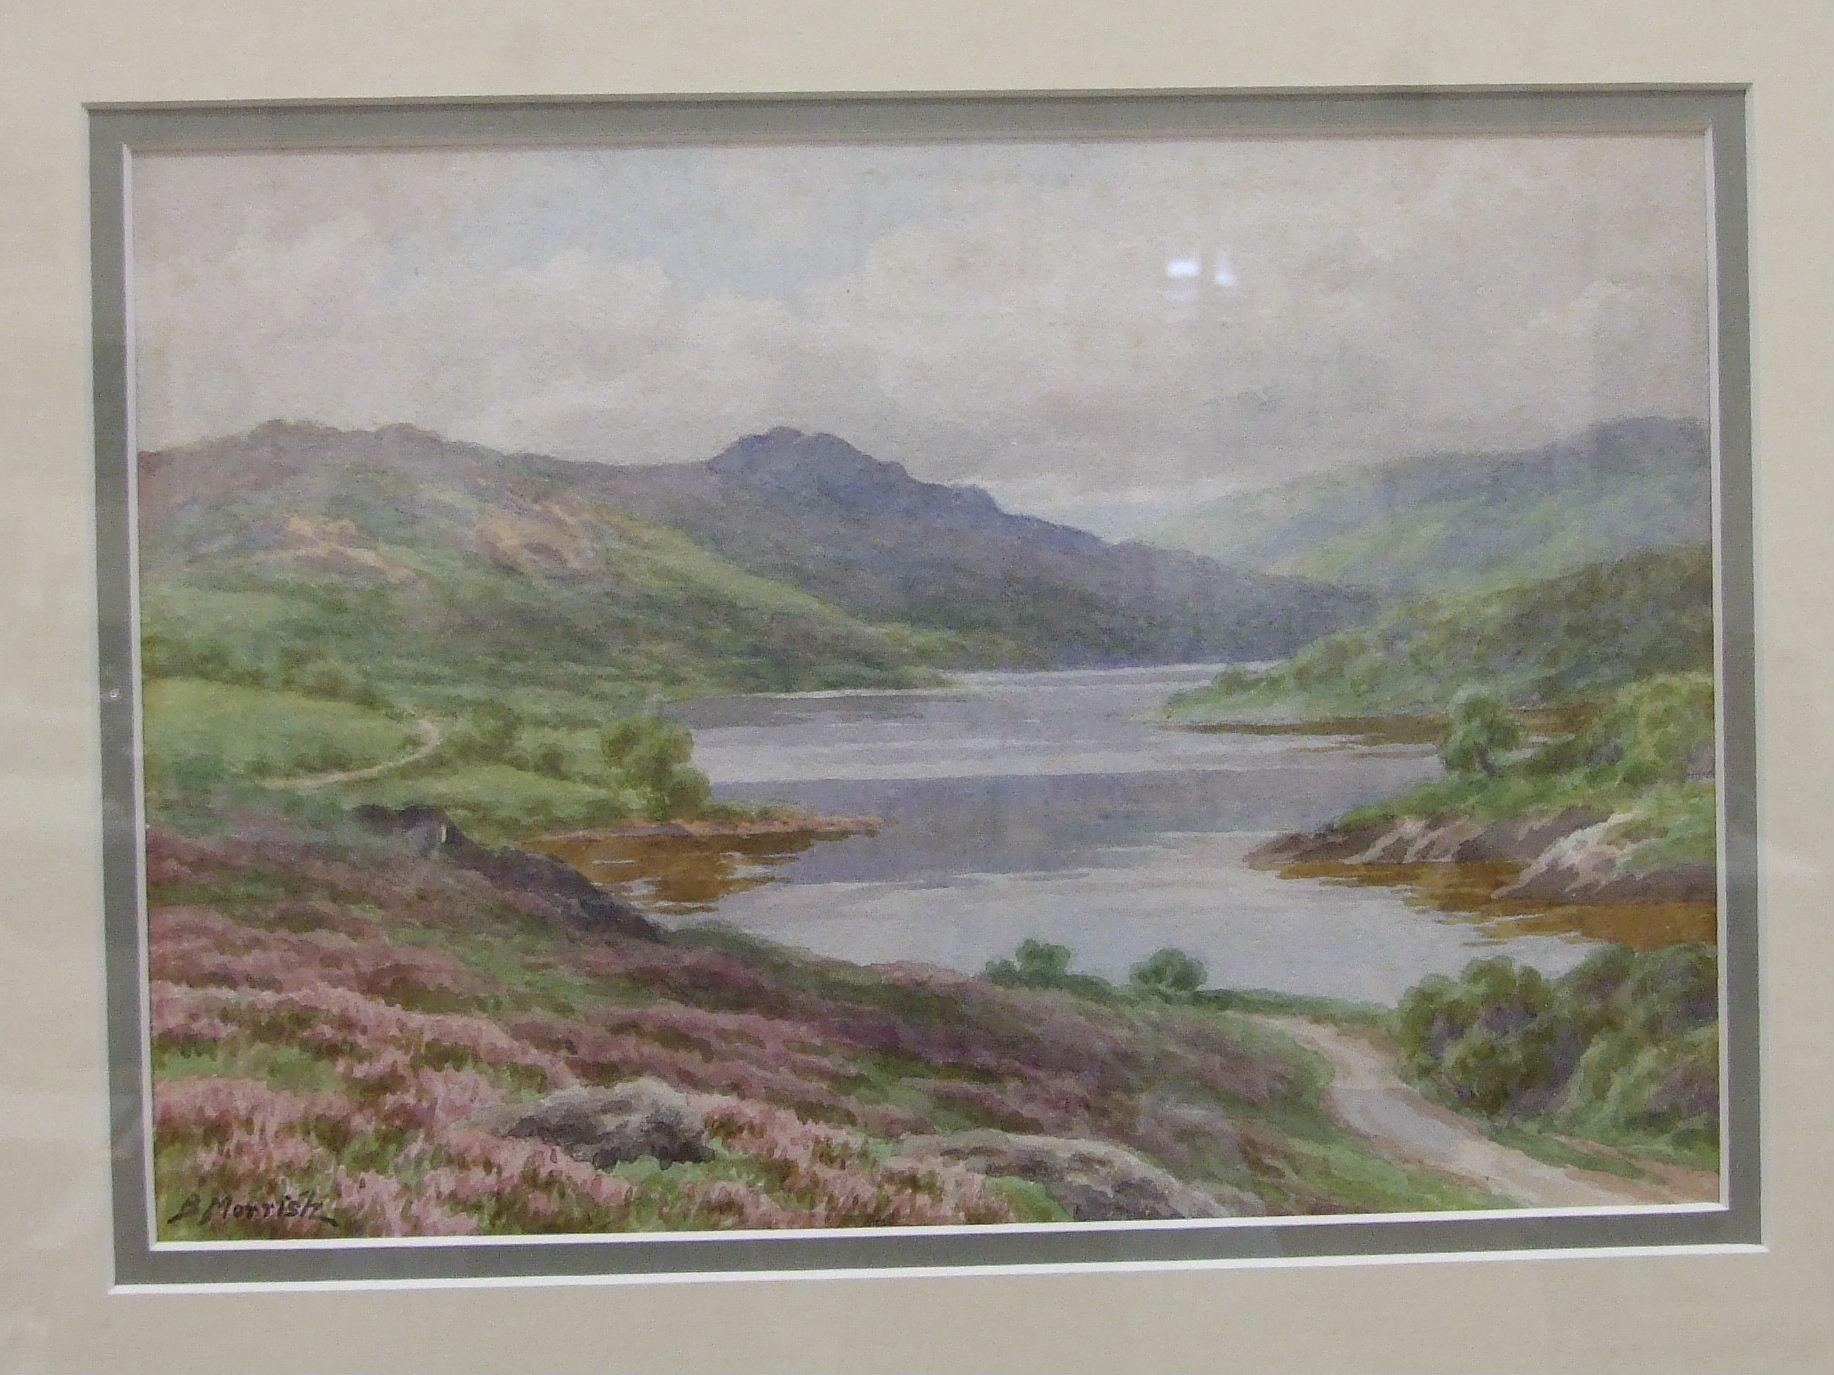 B Morrish, 'Mist Tor and Burrator Lake', signed watercolour, 18 x 27cm and Sue Mercer 'Sheepstor